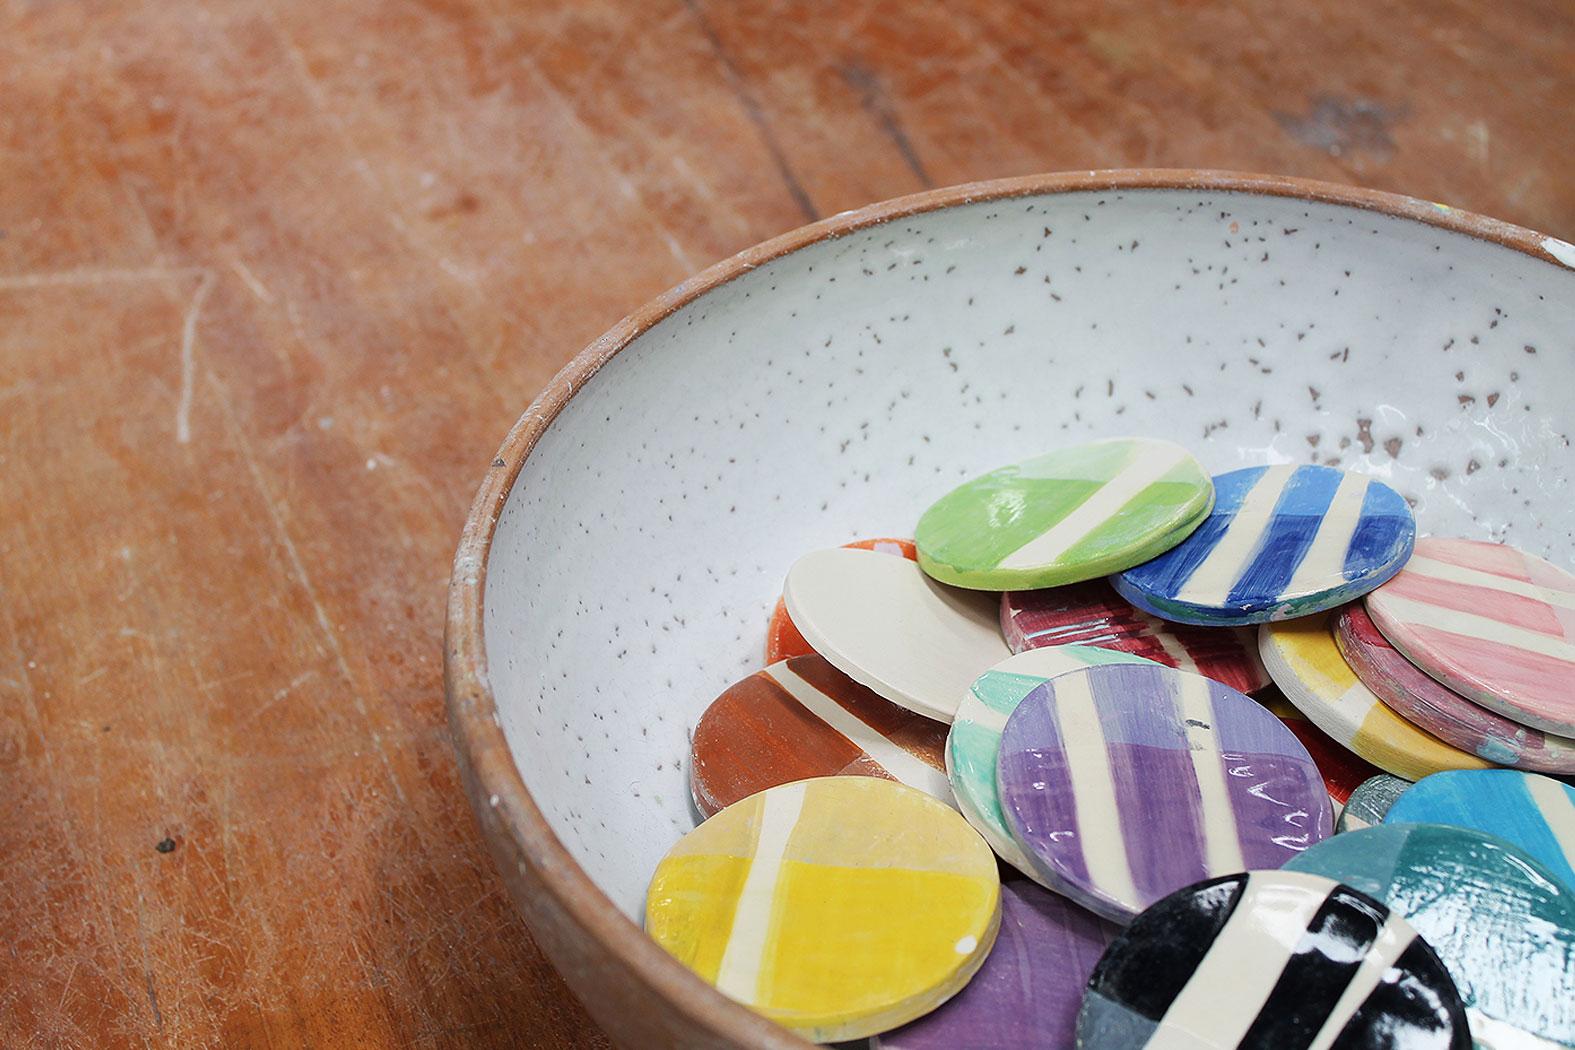 Chyka_pottery_tools1.jpg